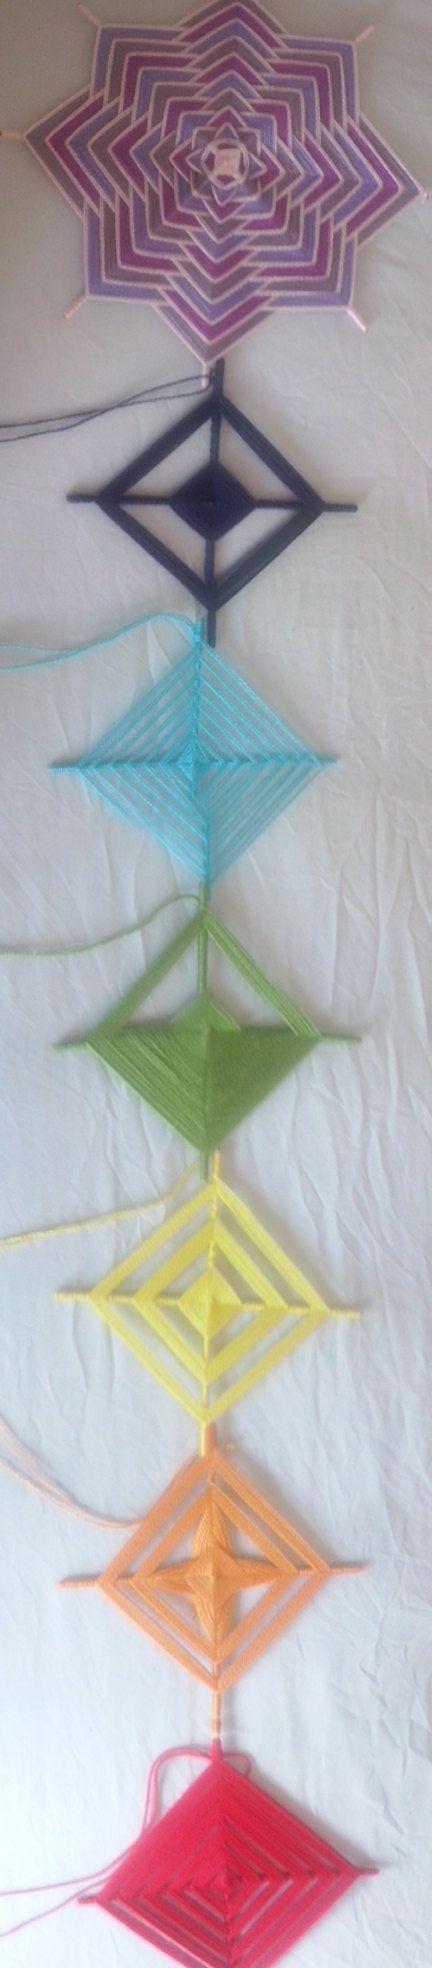 Los 7 chakras. Mandalas tejidos en lana